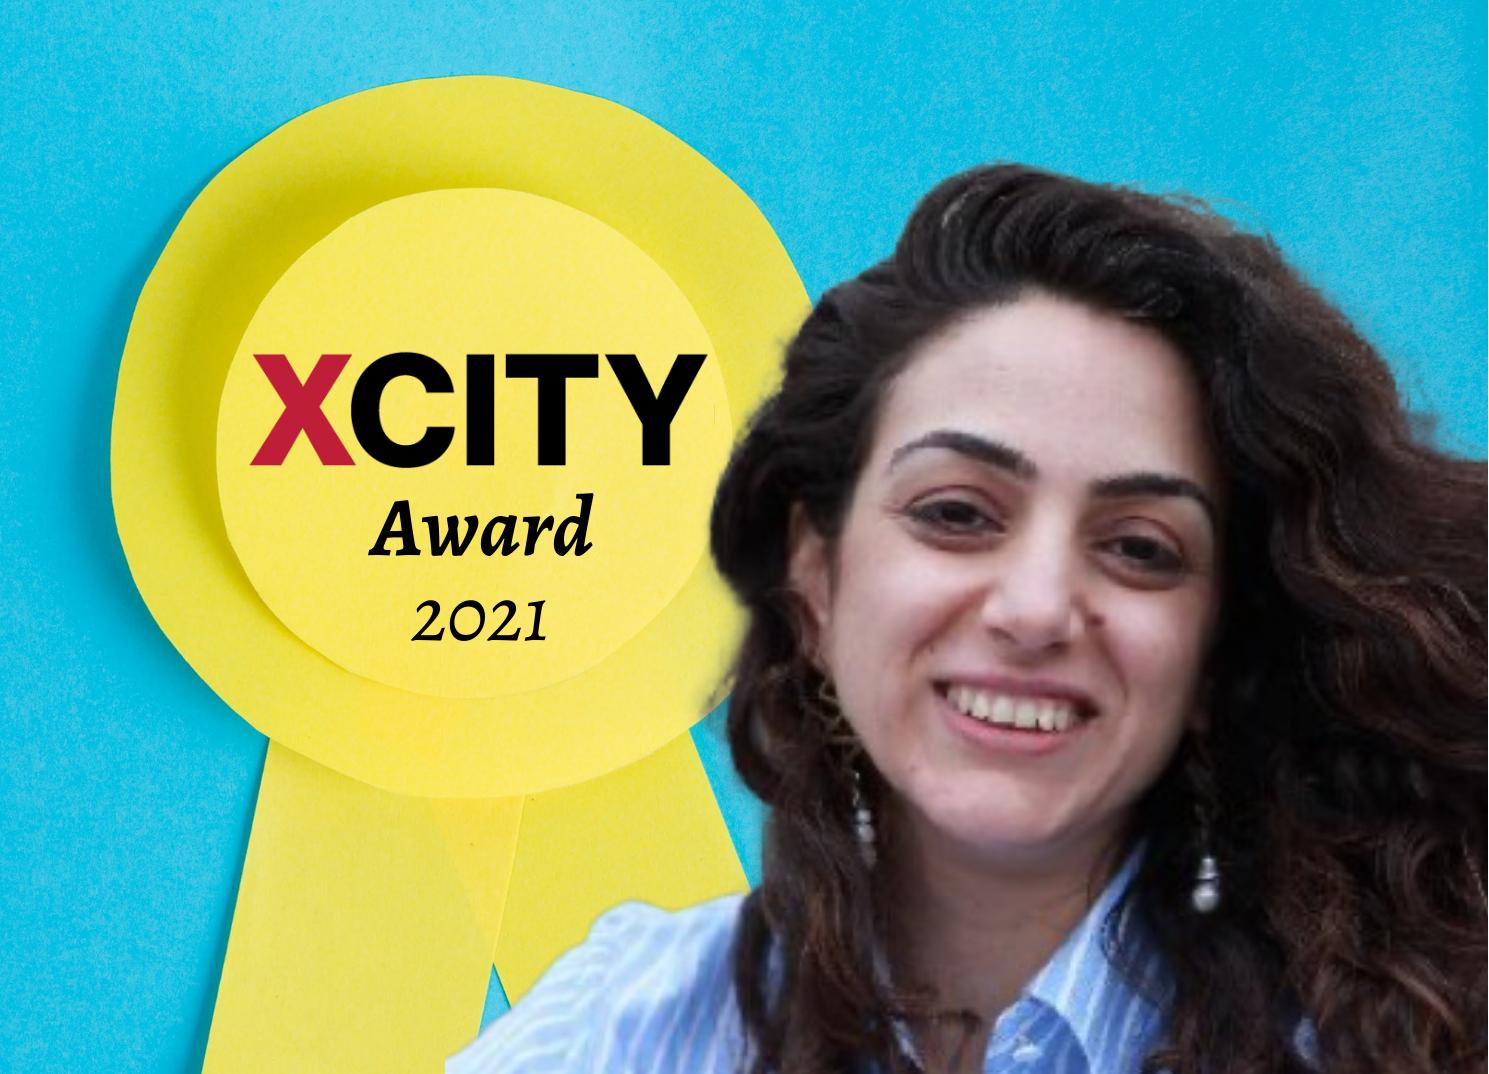 First name on XCity Award shortlist announced: Dina Aboughazala